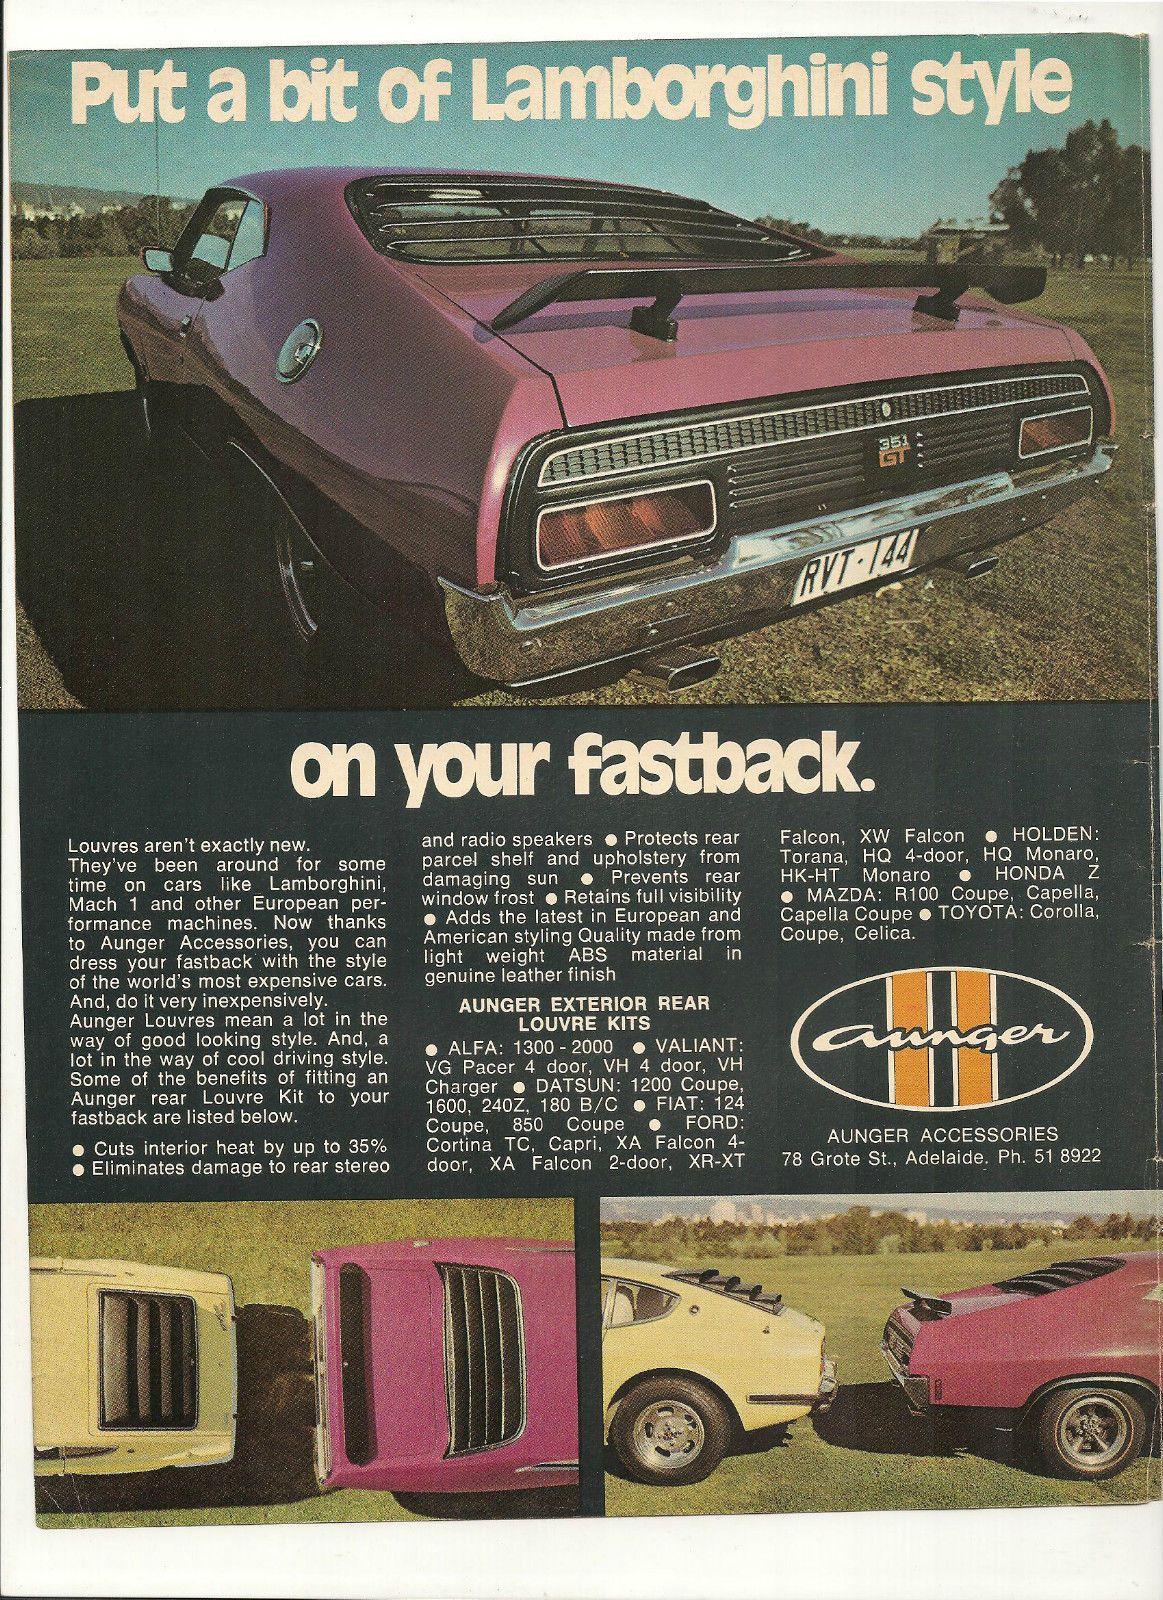 Original Vintage 1973 Aunger Louvres Australian Color Advert Ford GT Datsun | eBay